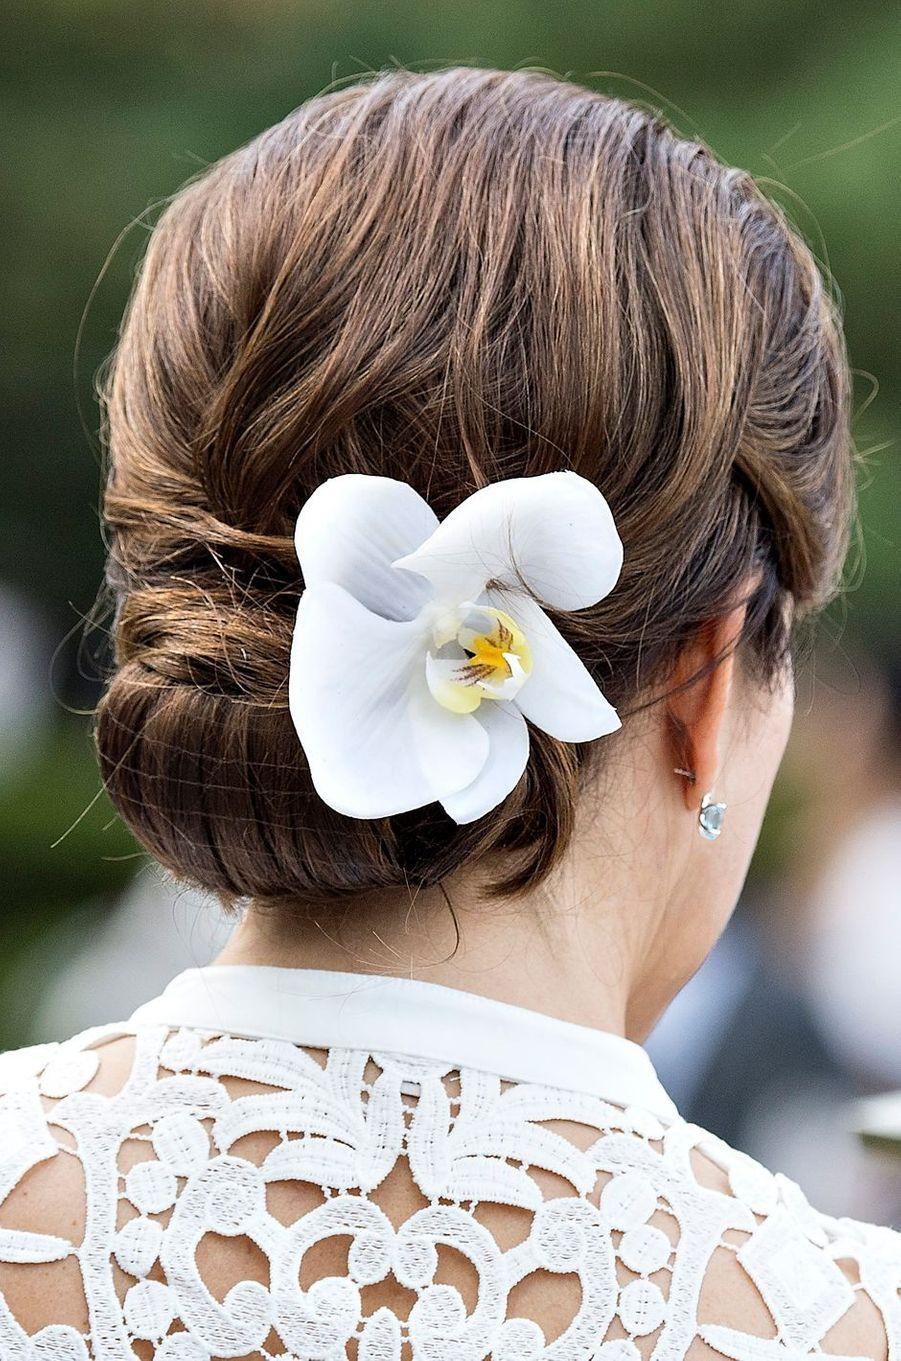 La coiffure de la princesse Mary de Danemark au Japon, le 9 octobre 2017